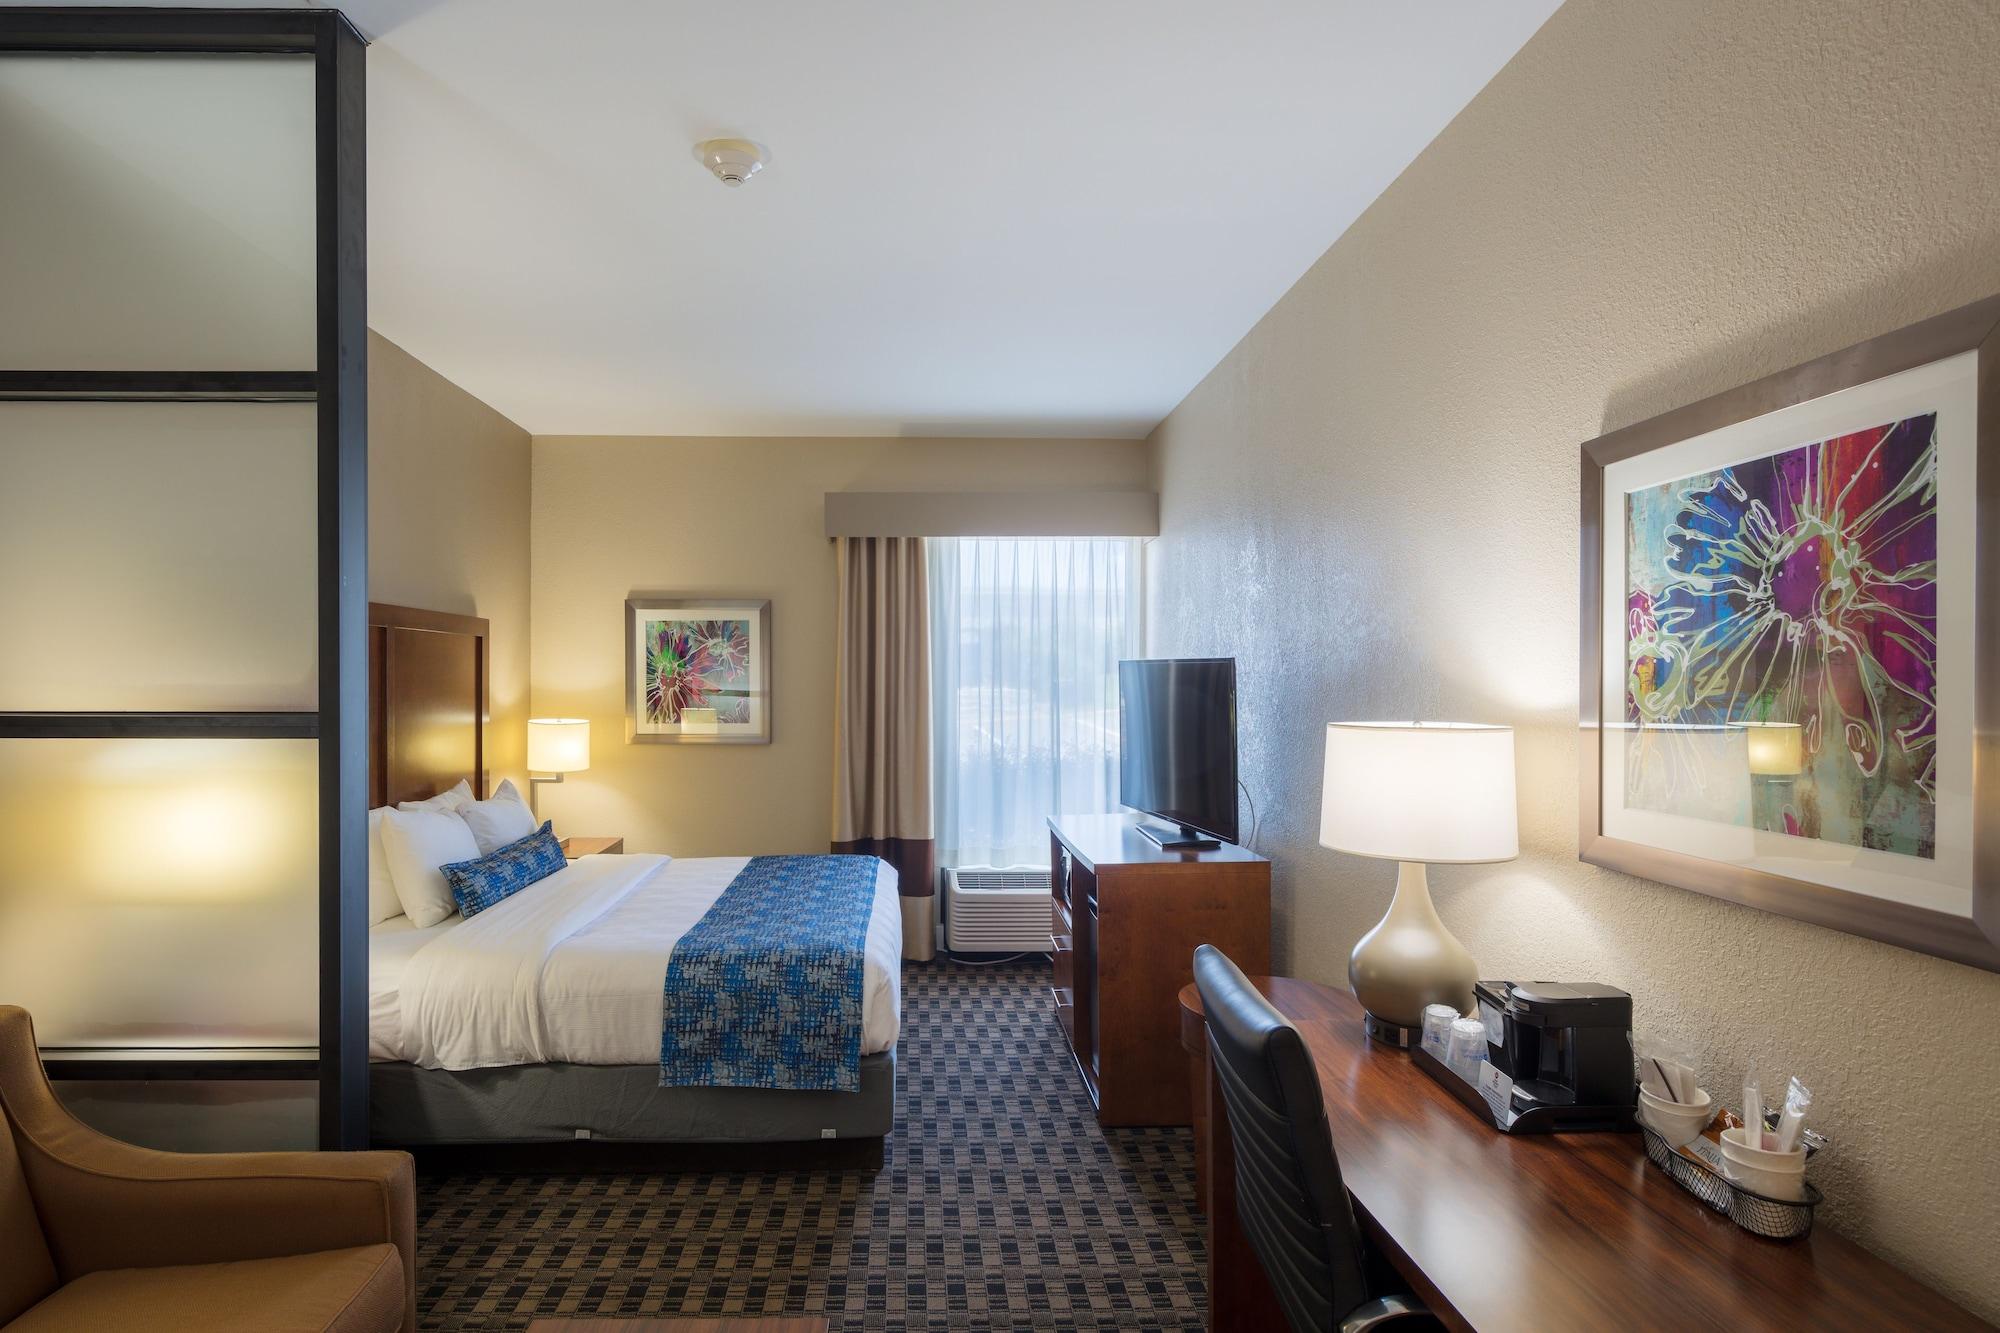 Best Western Plus Greenville I-385 Inn & Suites, Greenville